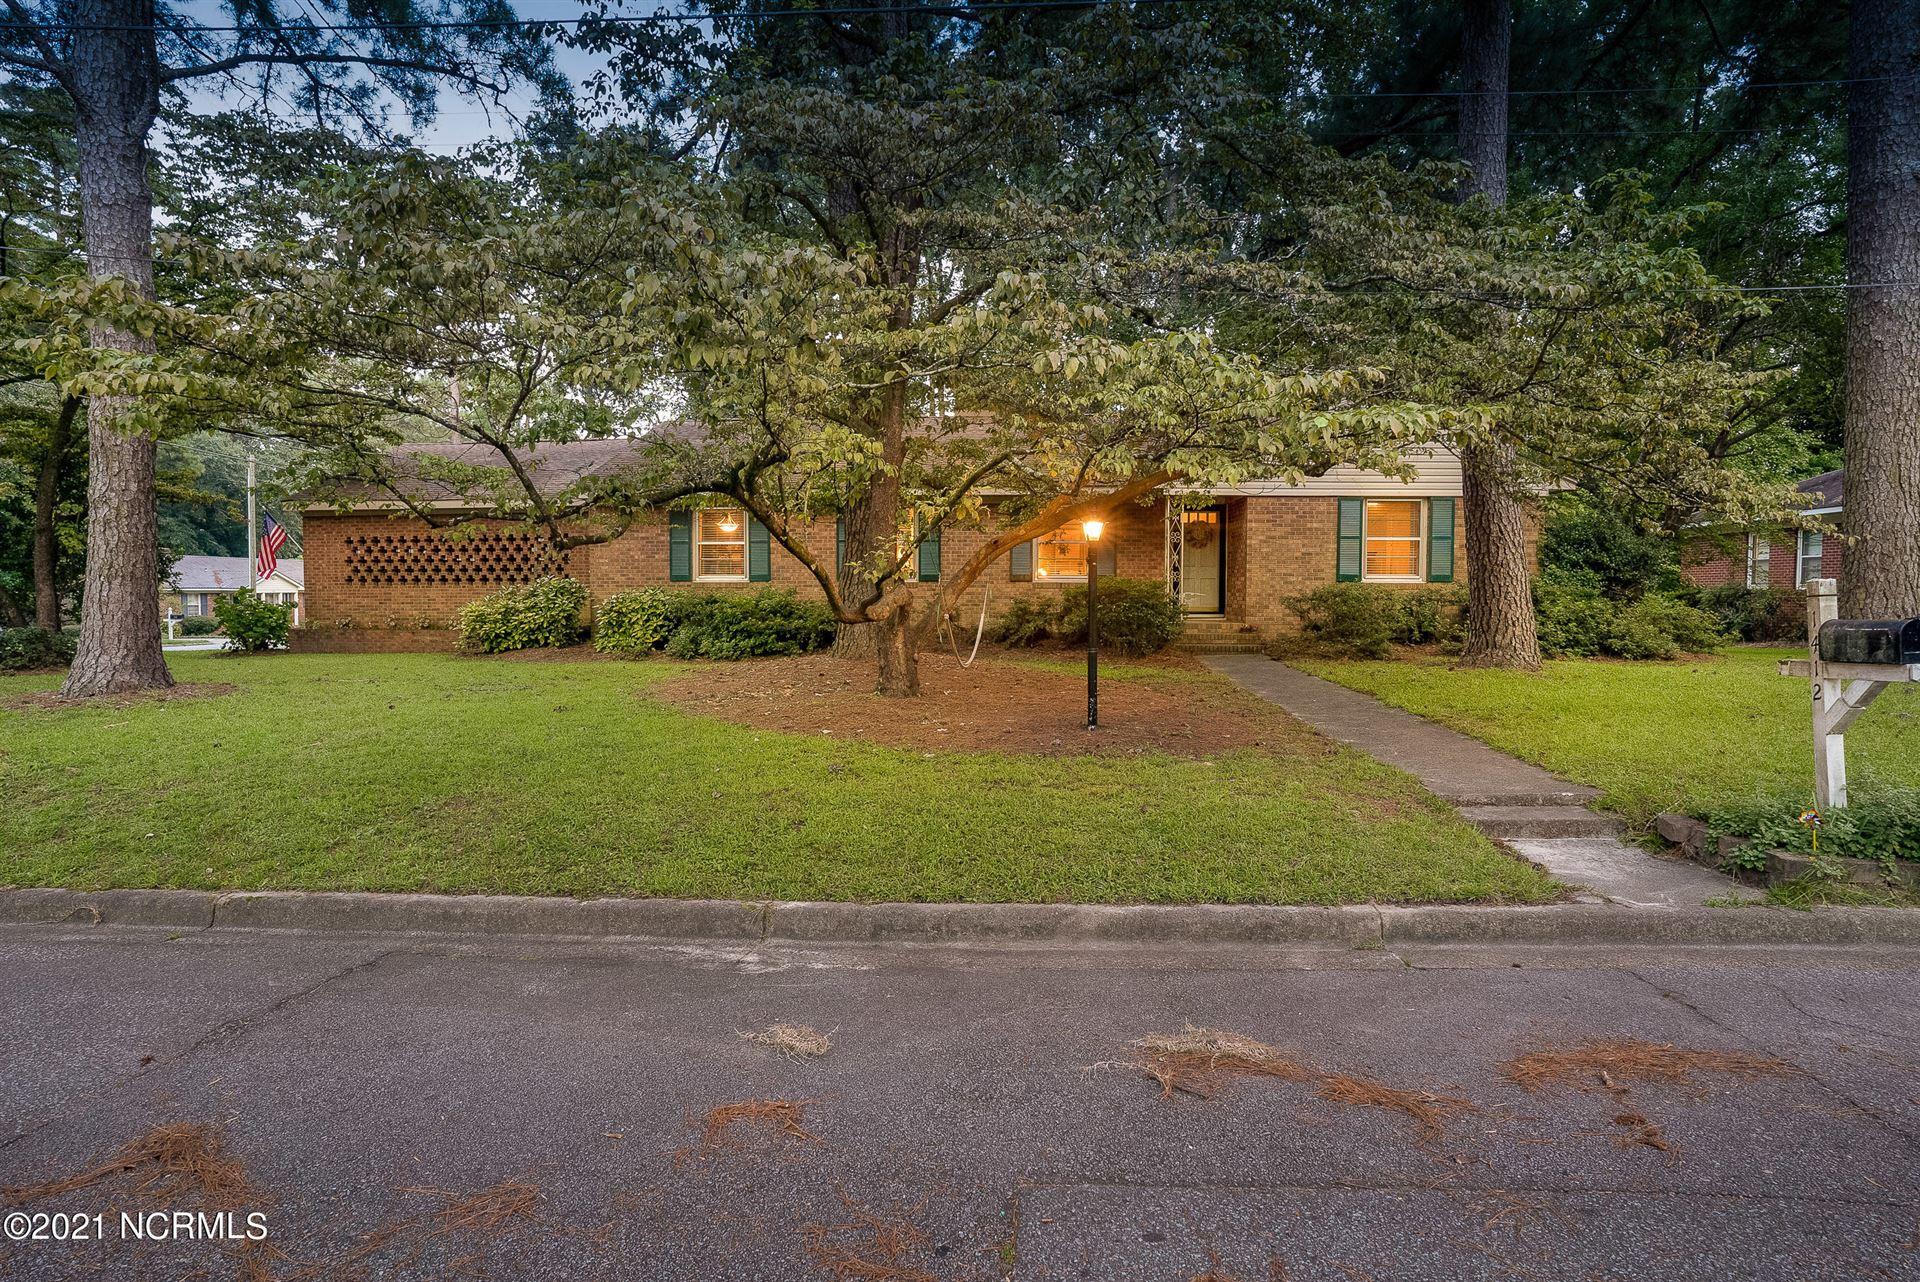 Photo of 1412 Evergreen Drive, Greenville, NC 27858 (MLS # 100286599)